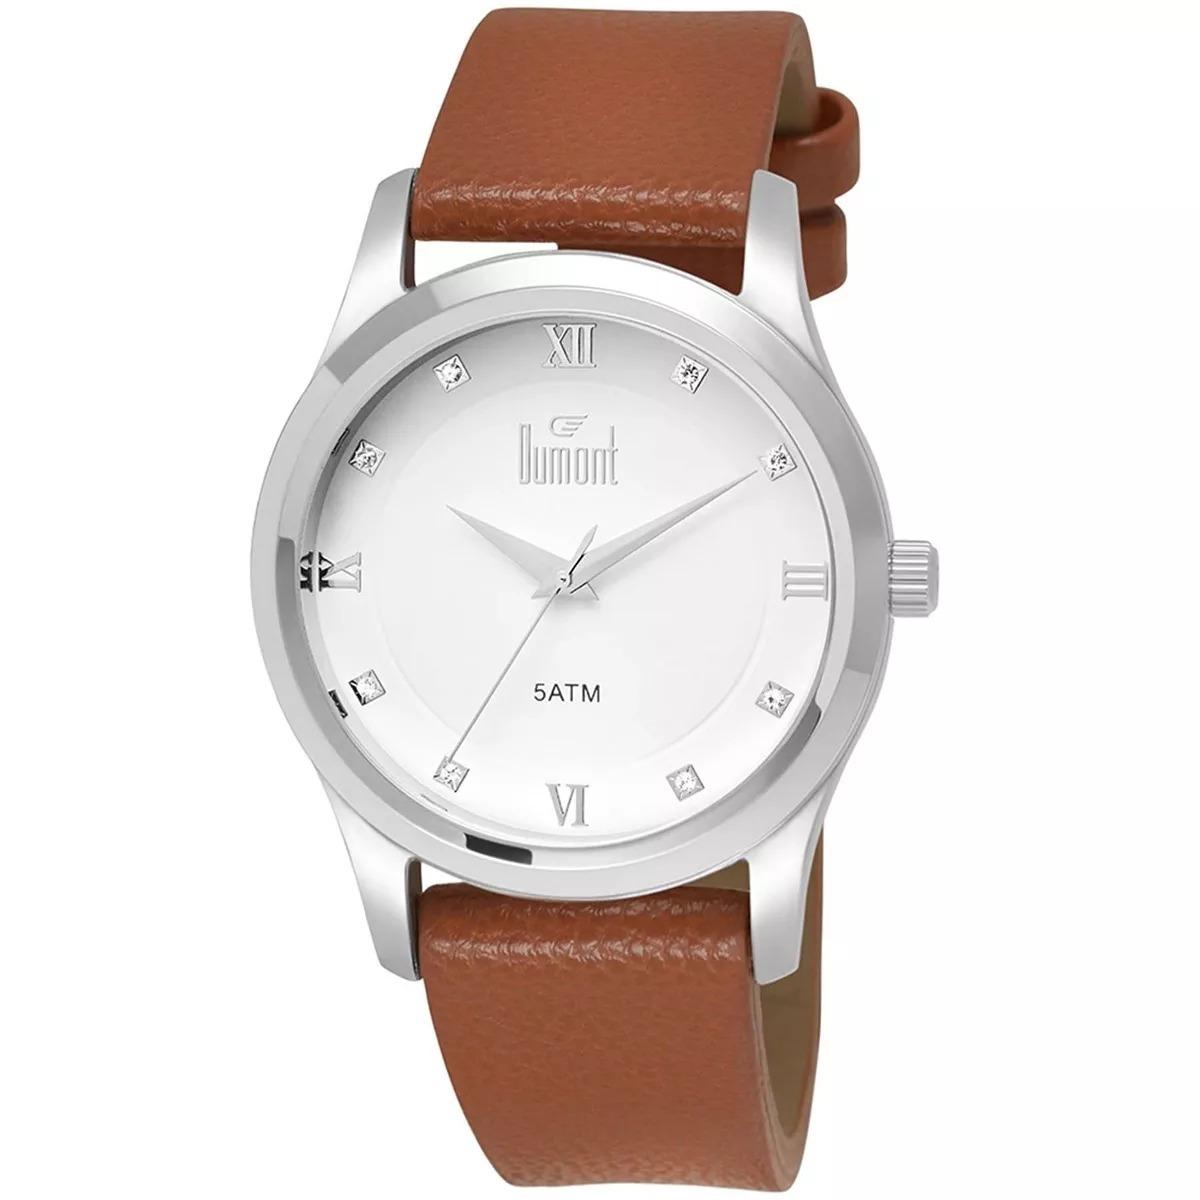 b6b8a6225de Relógio Dumont Feminino Analógico - Du2035luy 3b - R  149